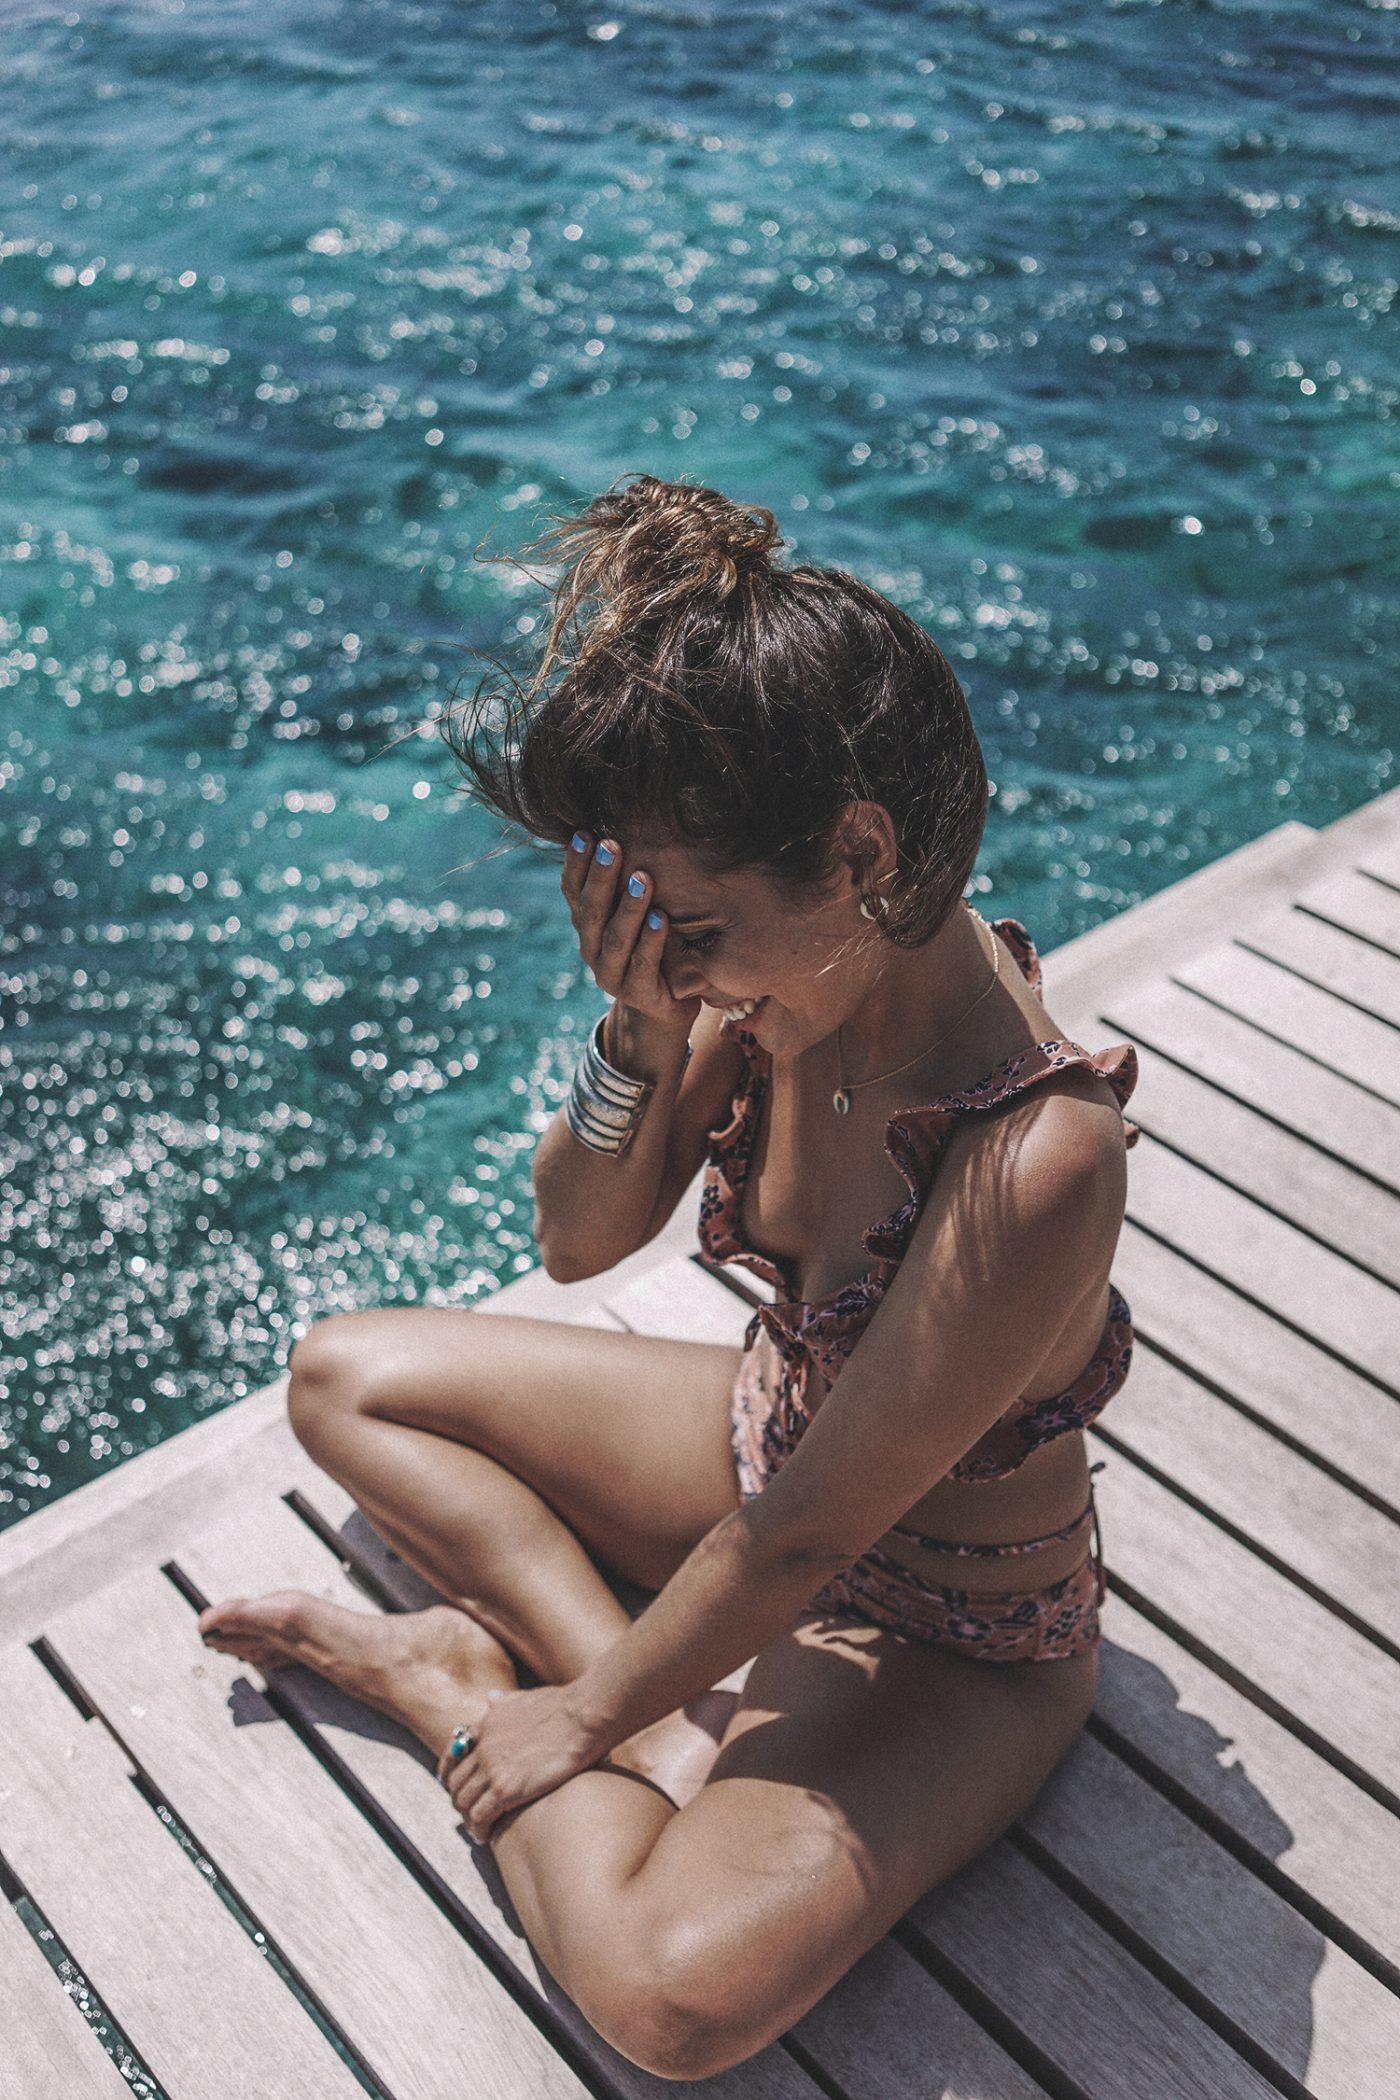 Mykonos-Beach-Summer-BeachWear-Bikini-For_Love_And_Lemons-Collage_Vintage-118